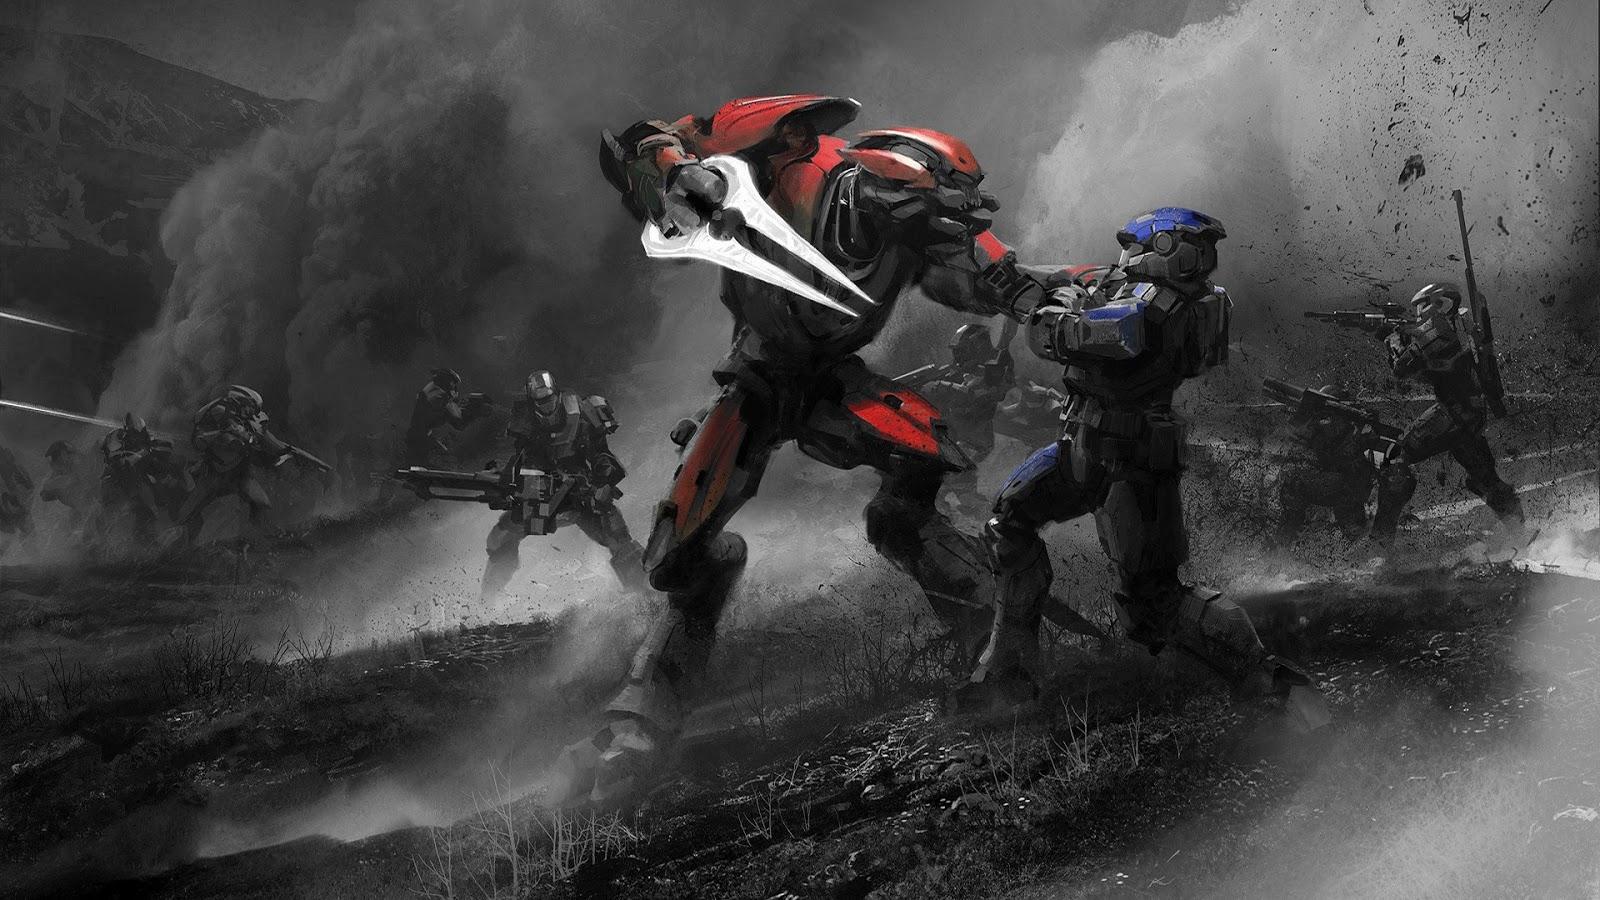 Halo ODST HD Wallpaper Halo Wallpaper   Ecro 1600x900